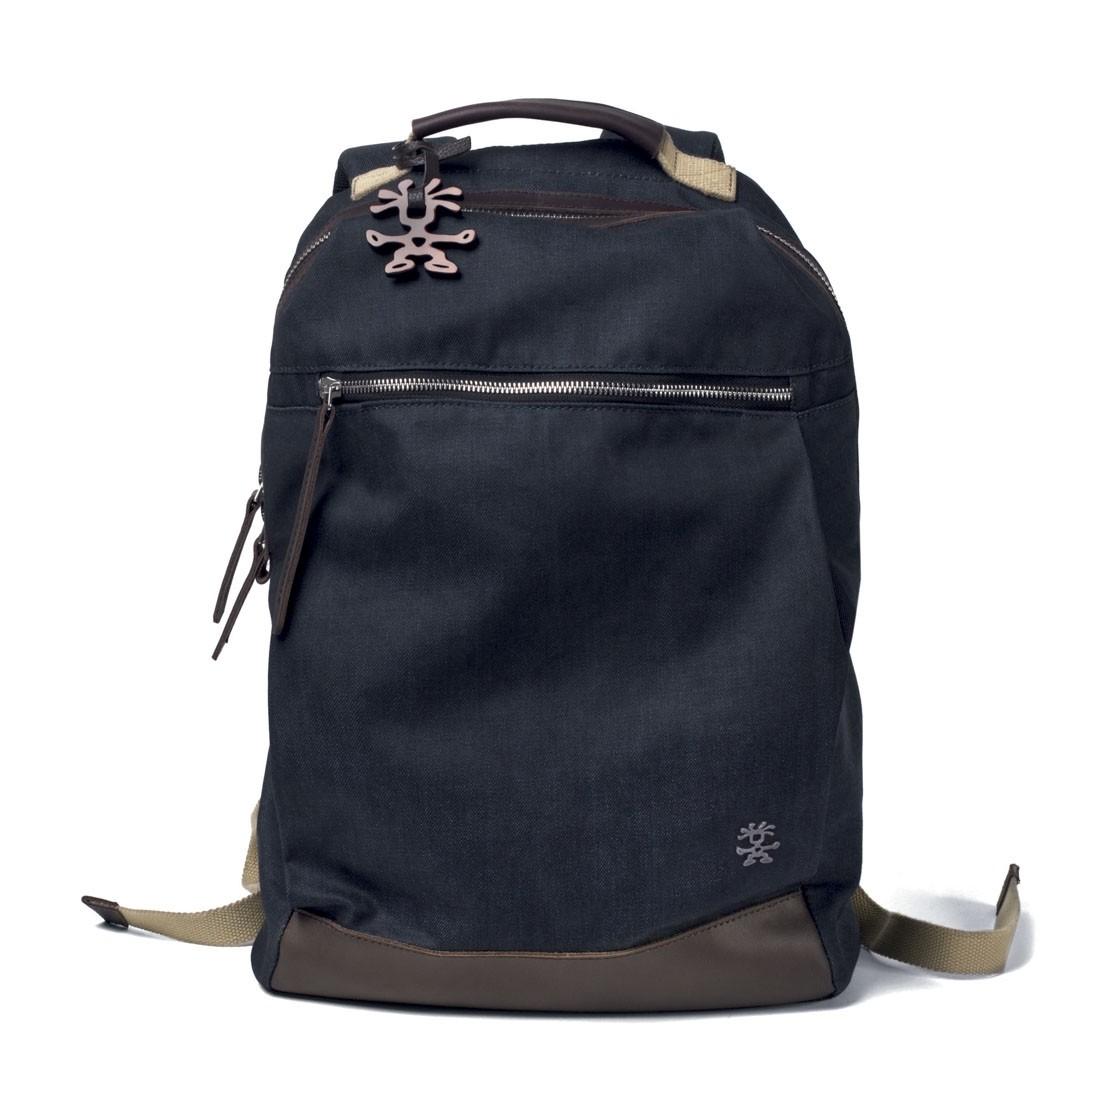 f43fc626962 Módní batoh na ntb Crumpler Betty Blue Backpack dk. denim   earth ...